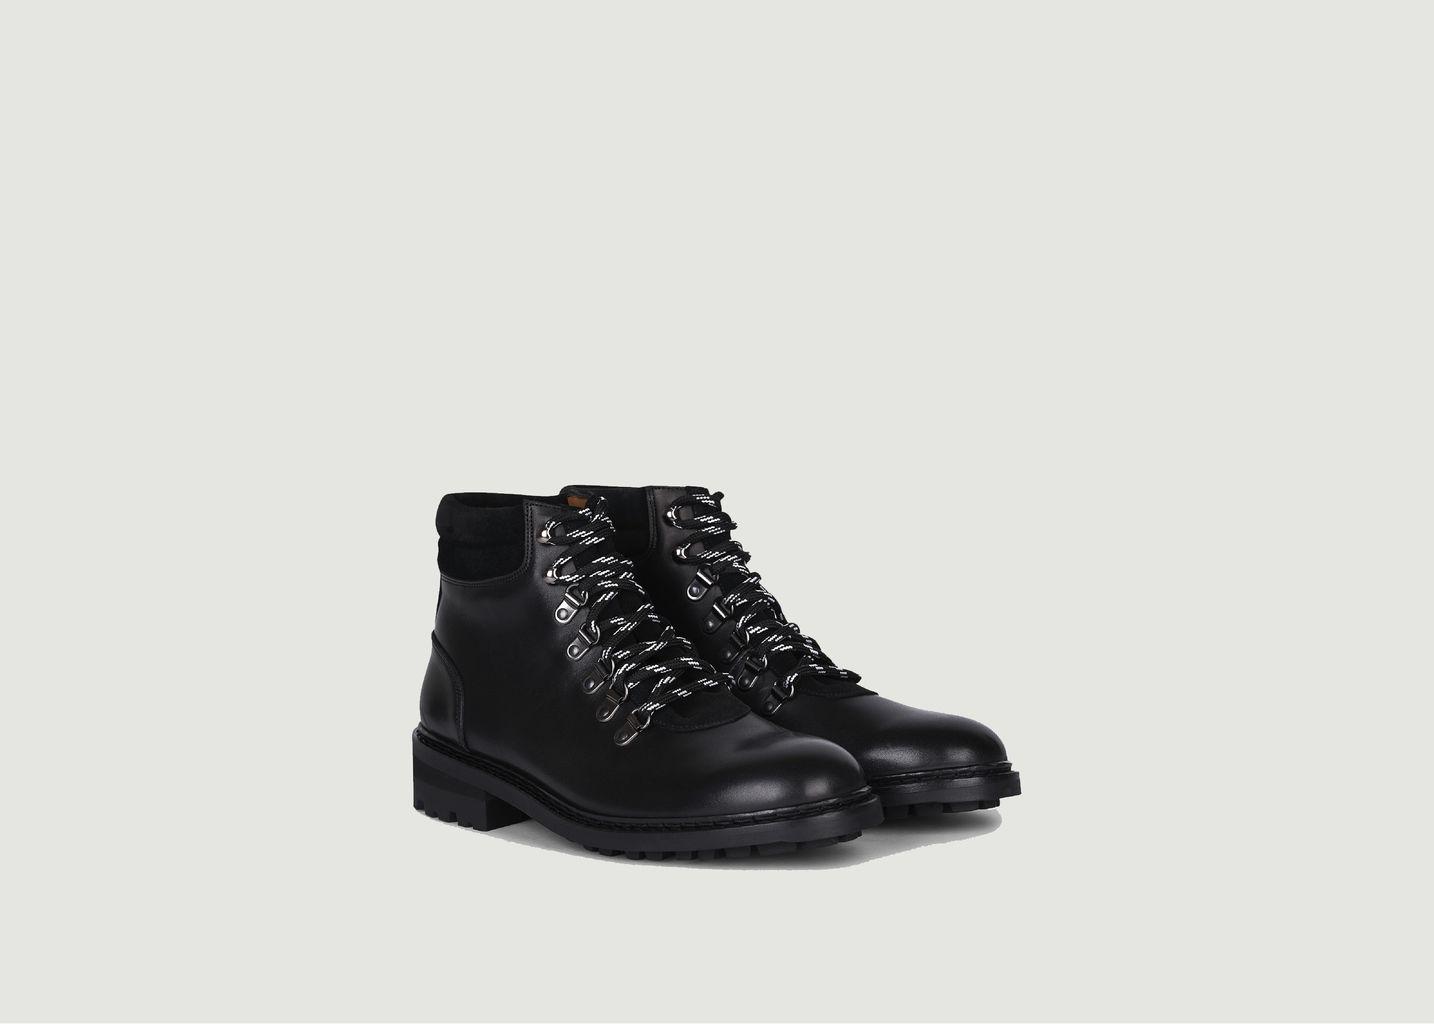 Boots Meribel - Anthology Paris